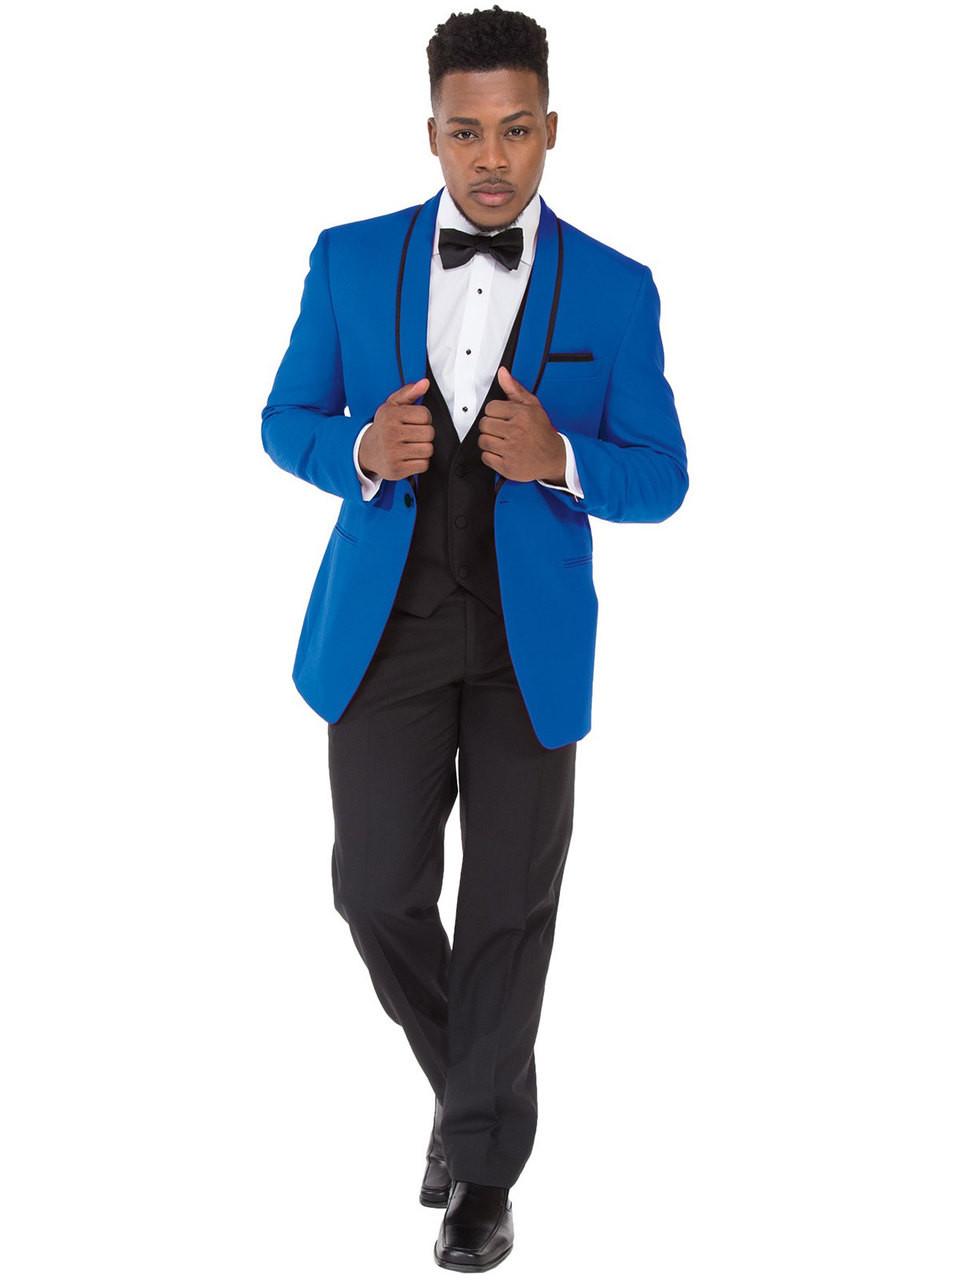 Royal Prom Tuxedo | PromHeadquarters.com